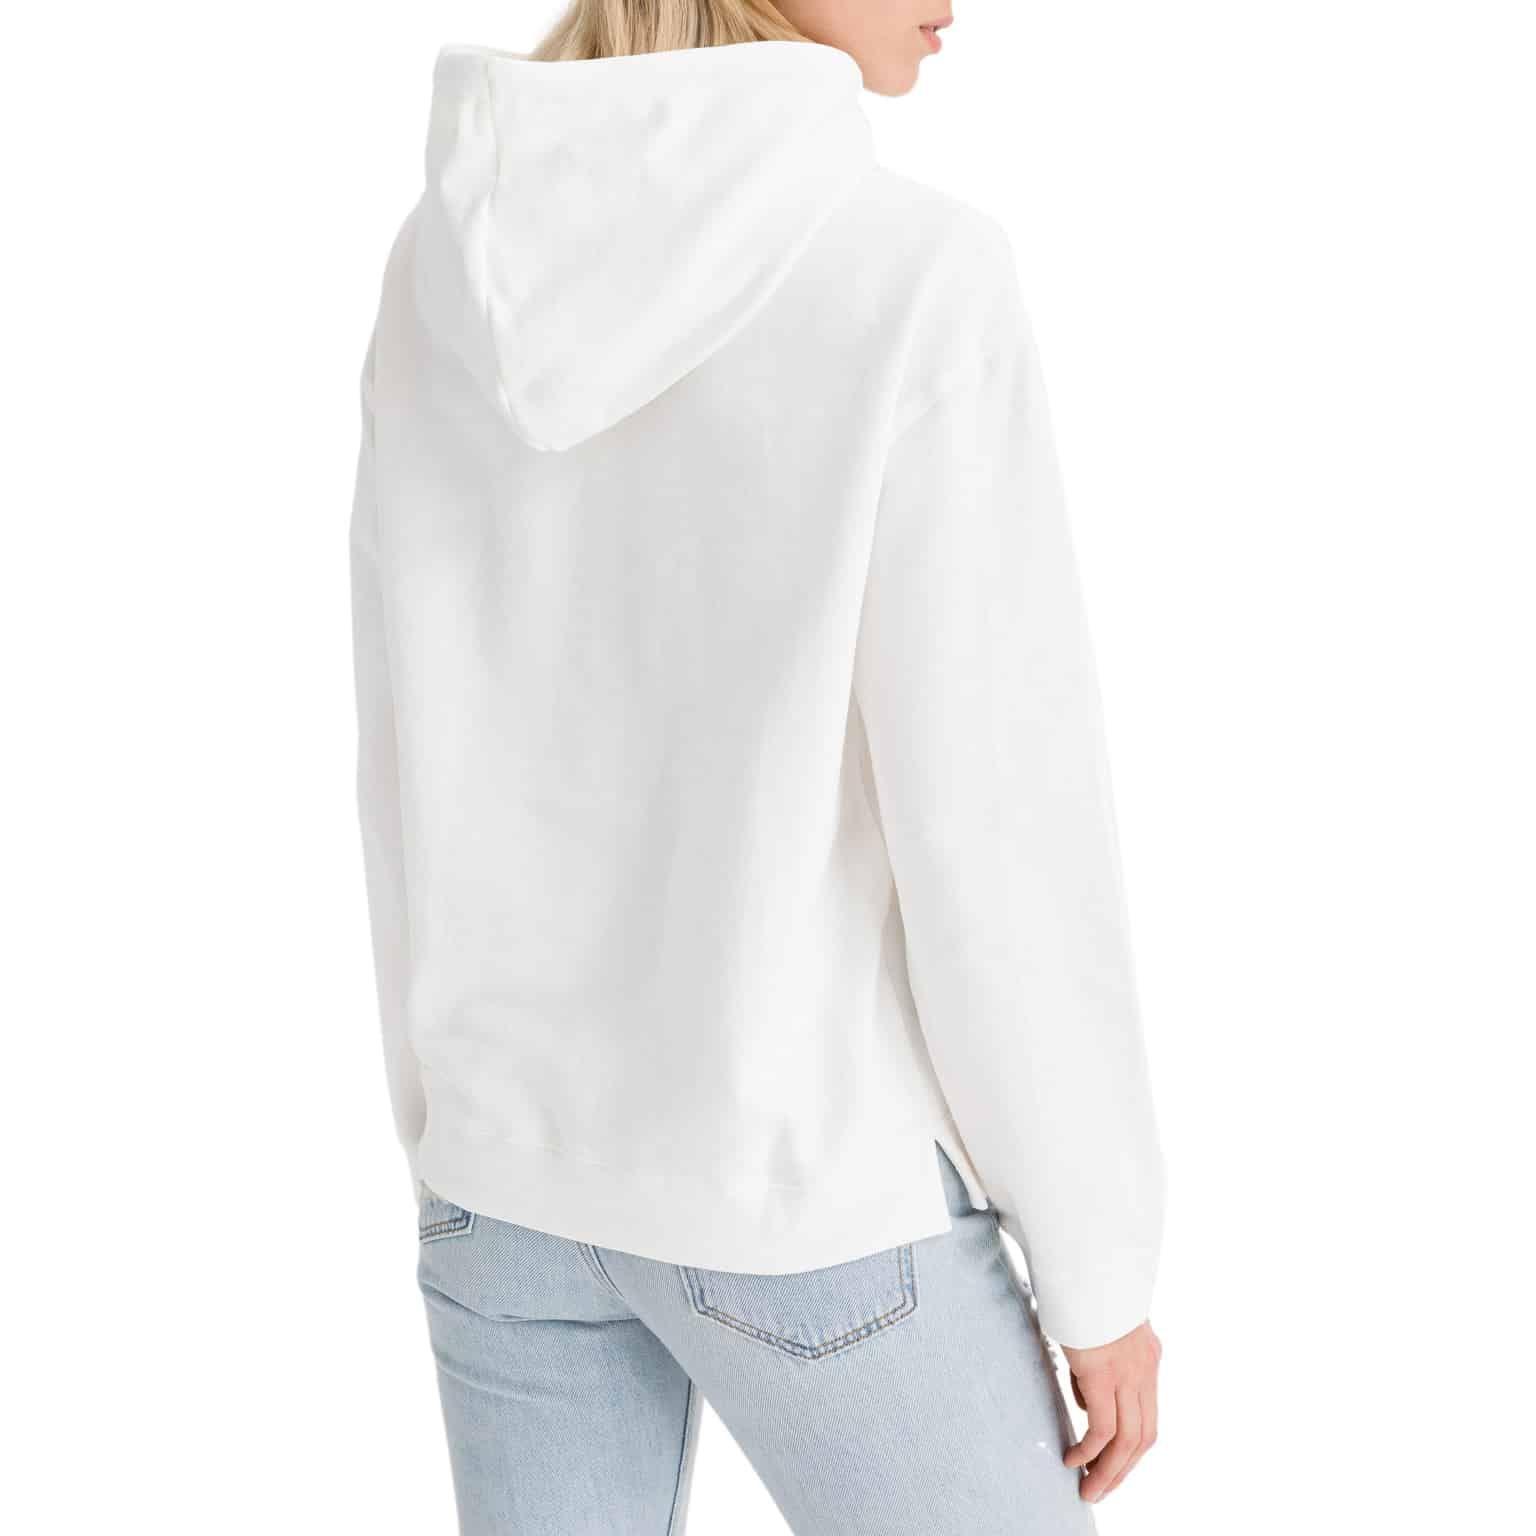 Pepe Jeans – ADELE_PL581068 – Blanco